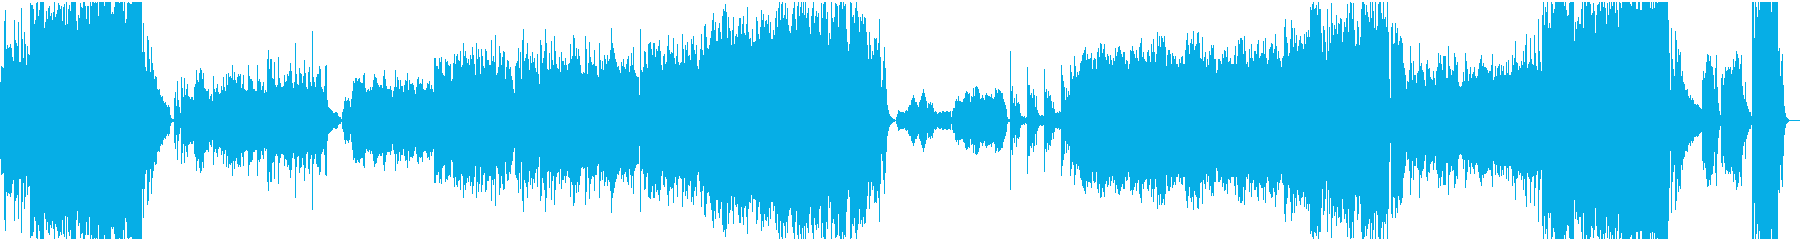 Grand Romantic Piano Concerto's reproduced waveform